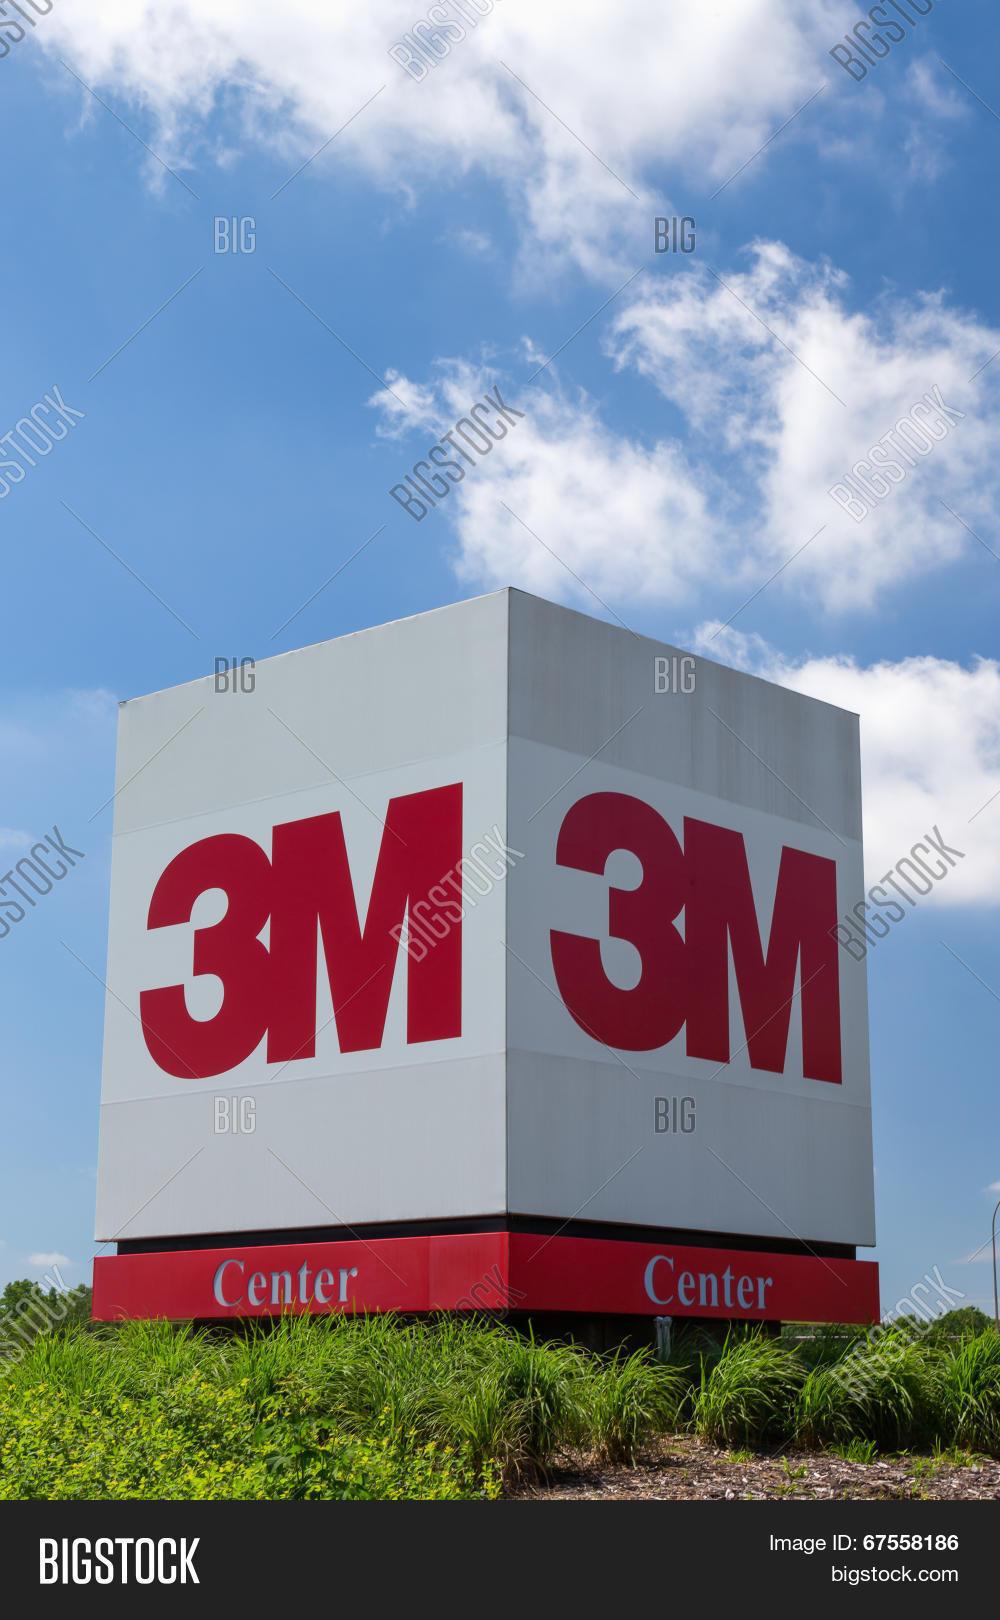 3M Corporate Image & Photo (Free Trial) | Bigstock